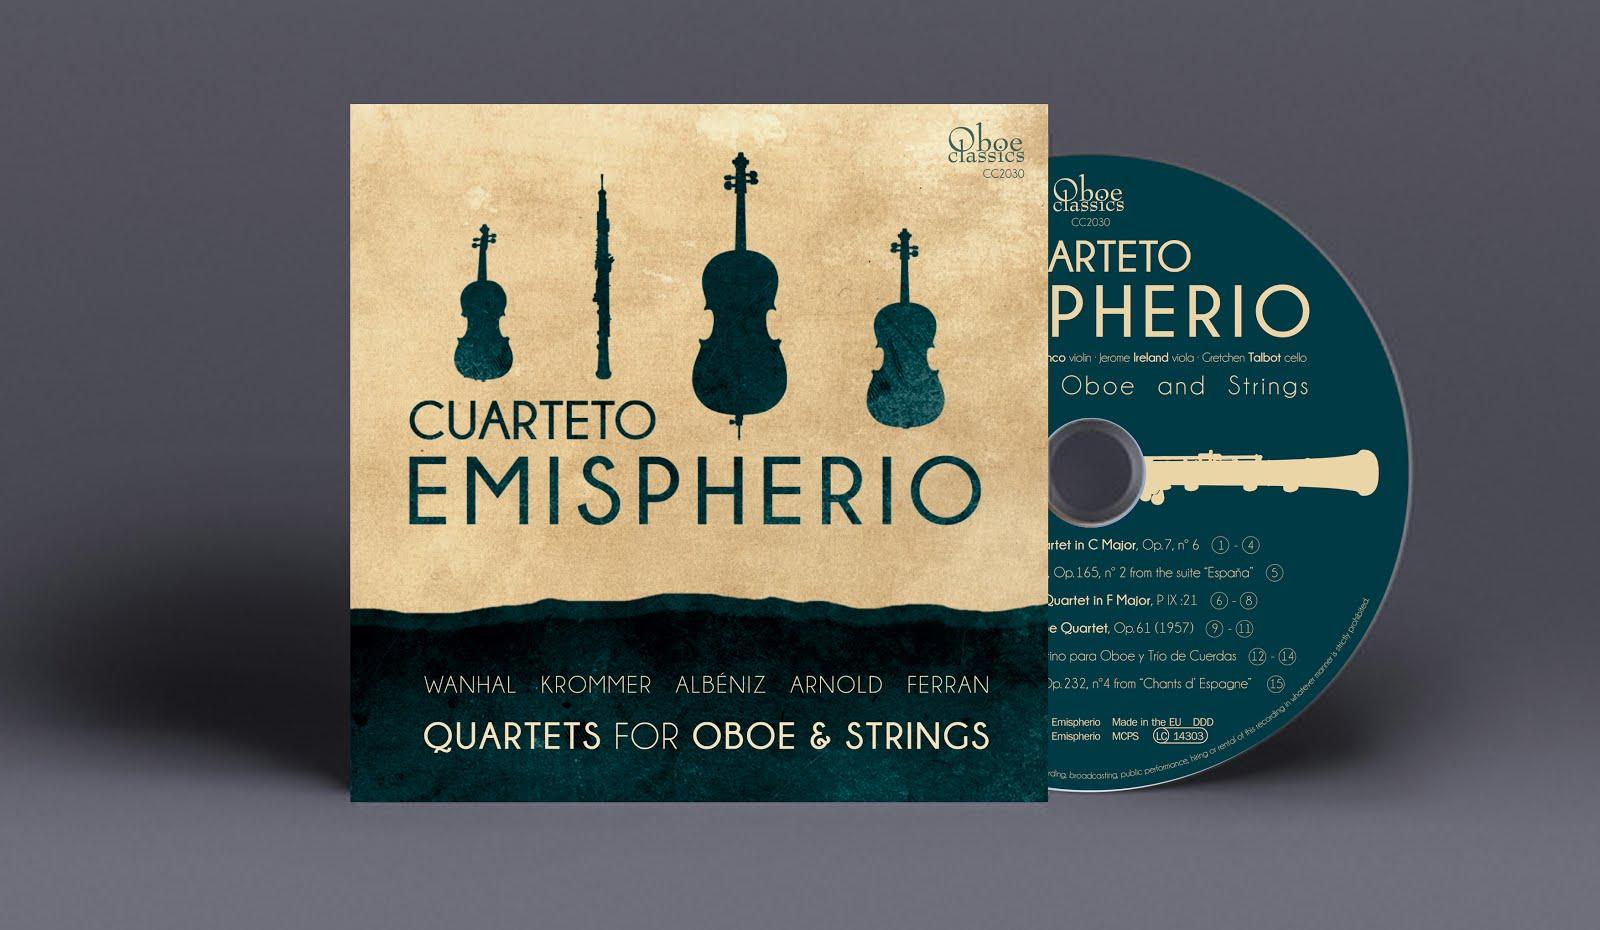 Cuarteto Emispherio